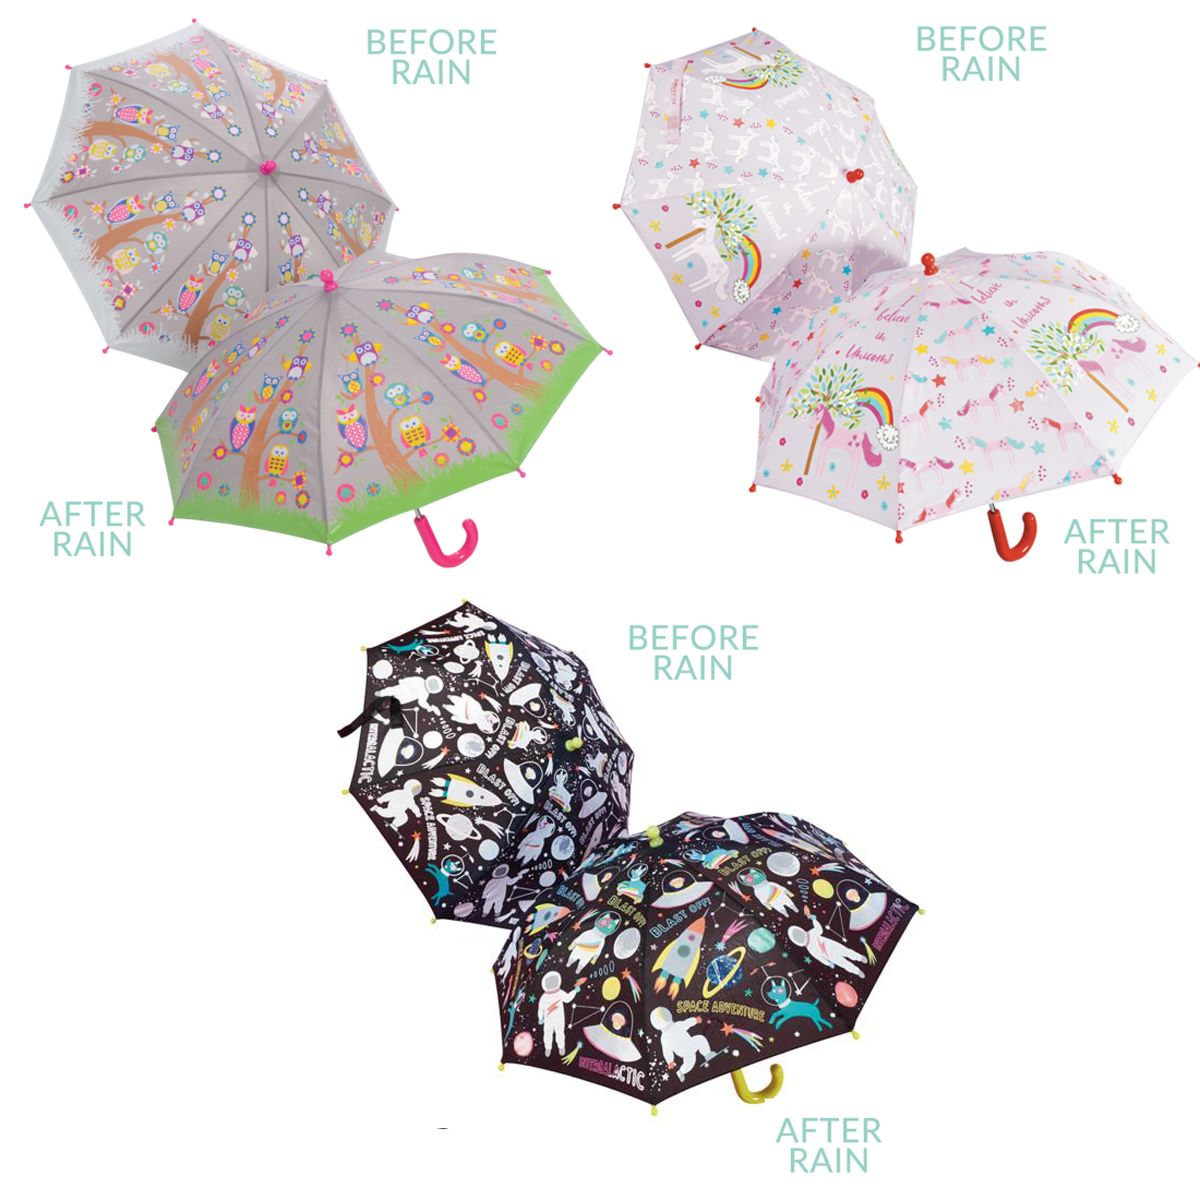 Floss & Rock Colour Changing Children's Umbrellas